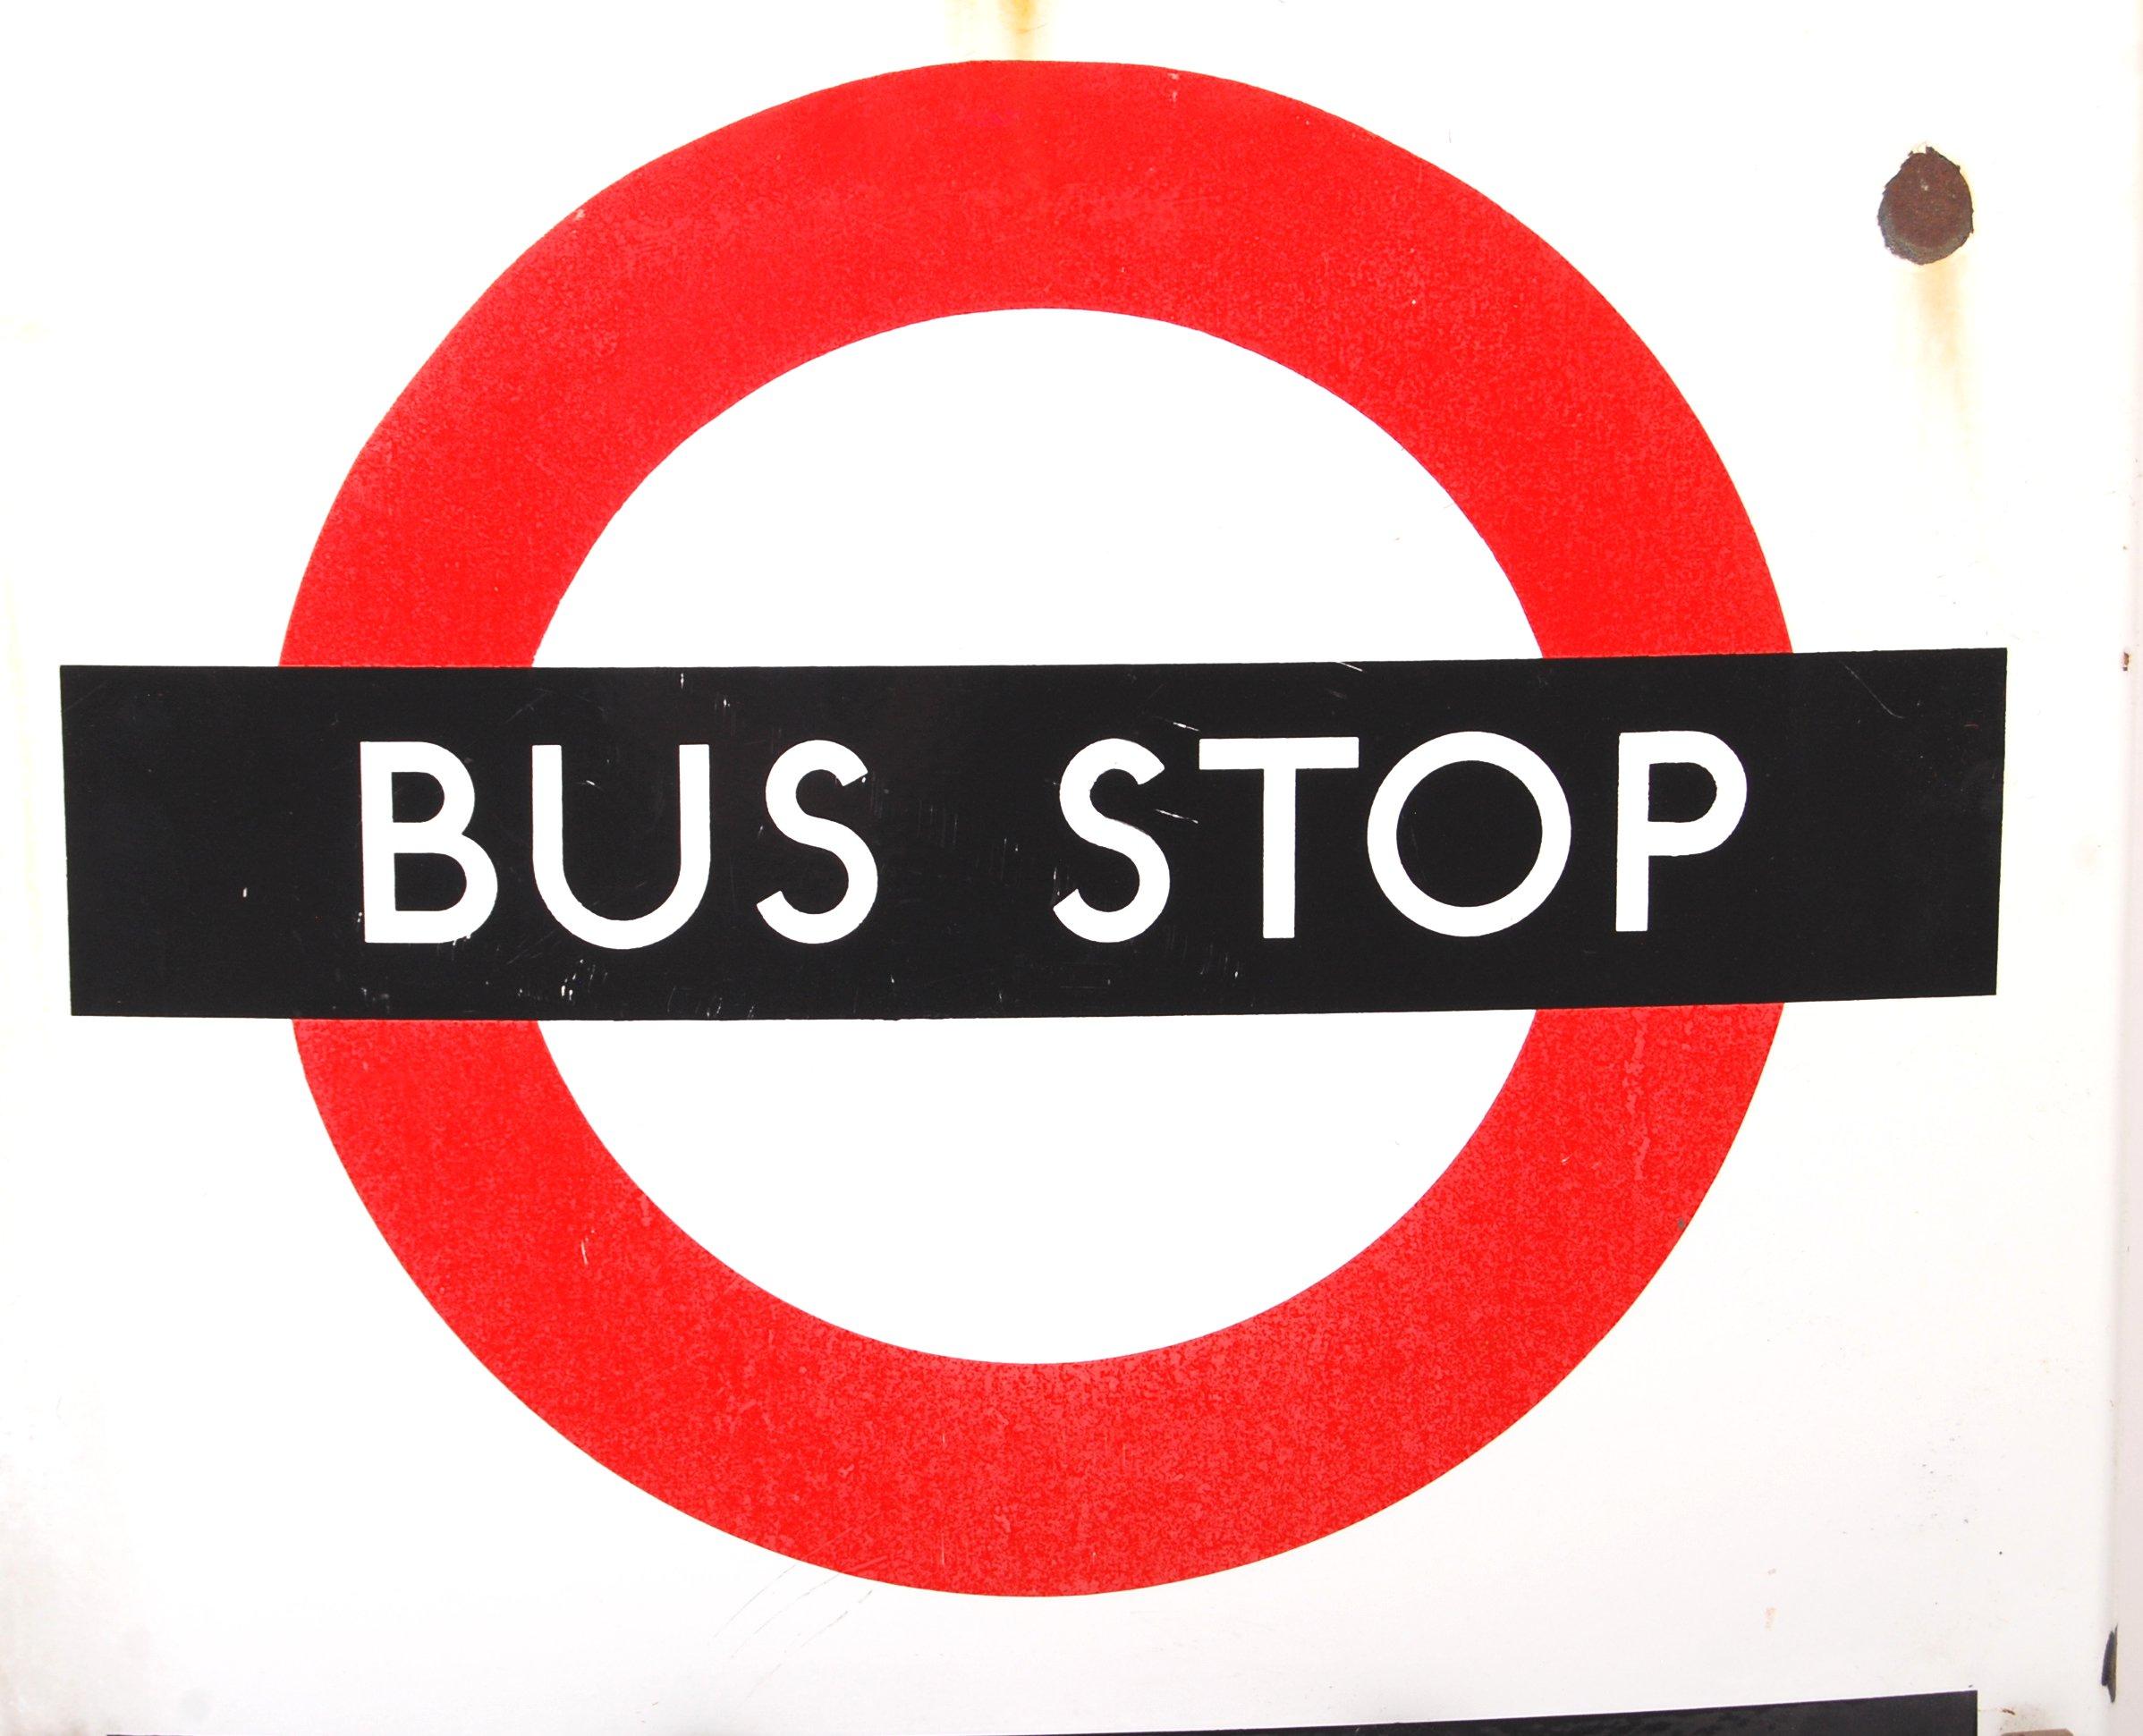 Lot 16 - RARE VINTAGE LONDON TRANSPORT ' BUS STOP ' ENAMEL DOUBLE SIDED SIGN